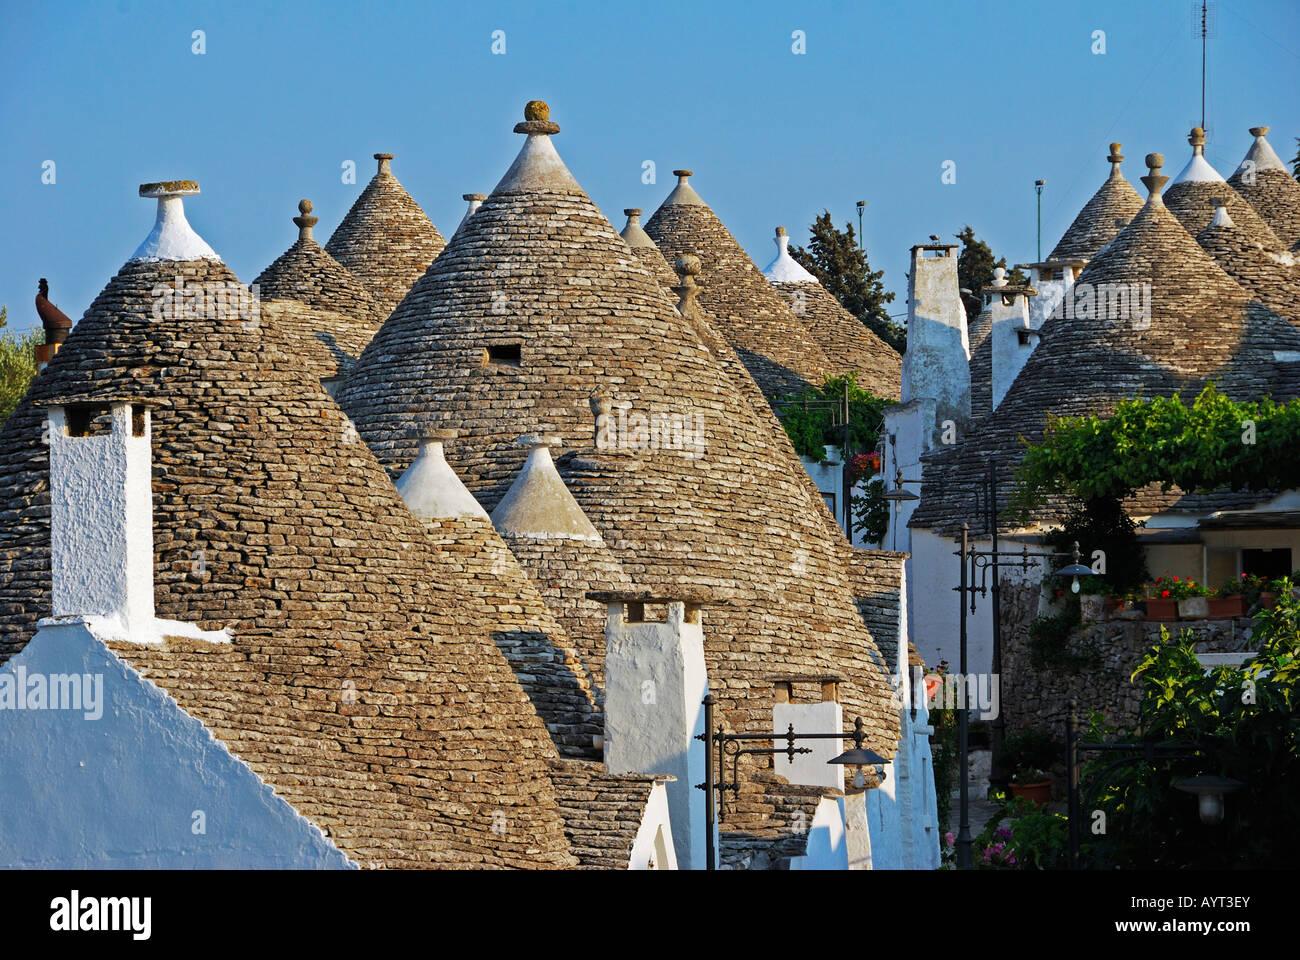 Trulli round houses of Alberobello UNESCO World Heritage Site Stock Photo